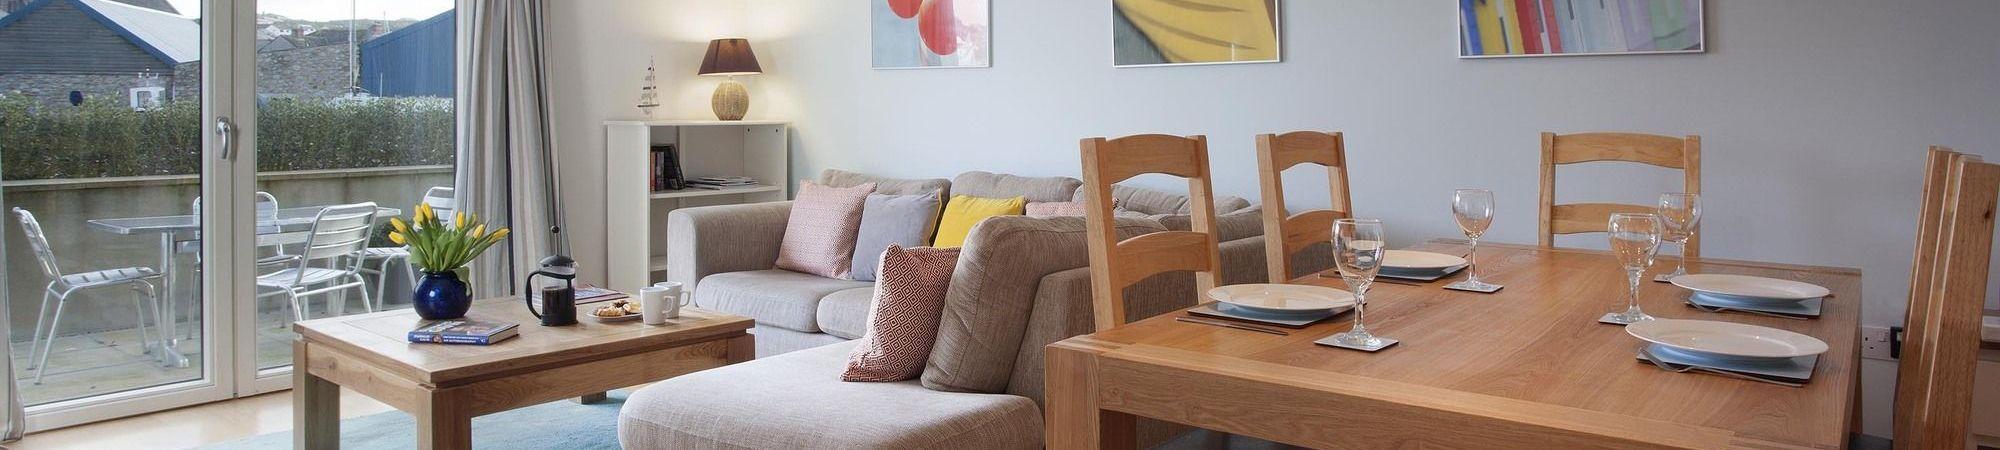 Spinnaker Apartment - Porthleven Holiday Cottages